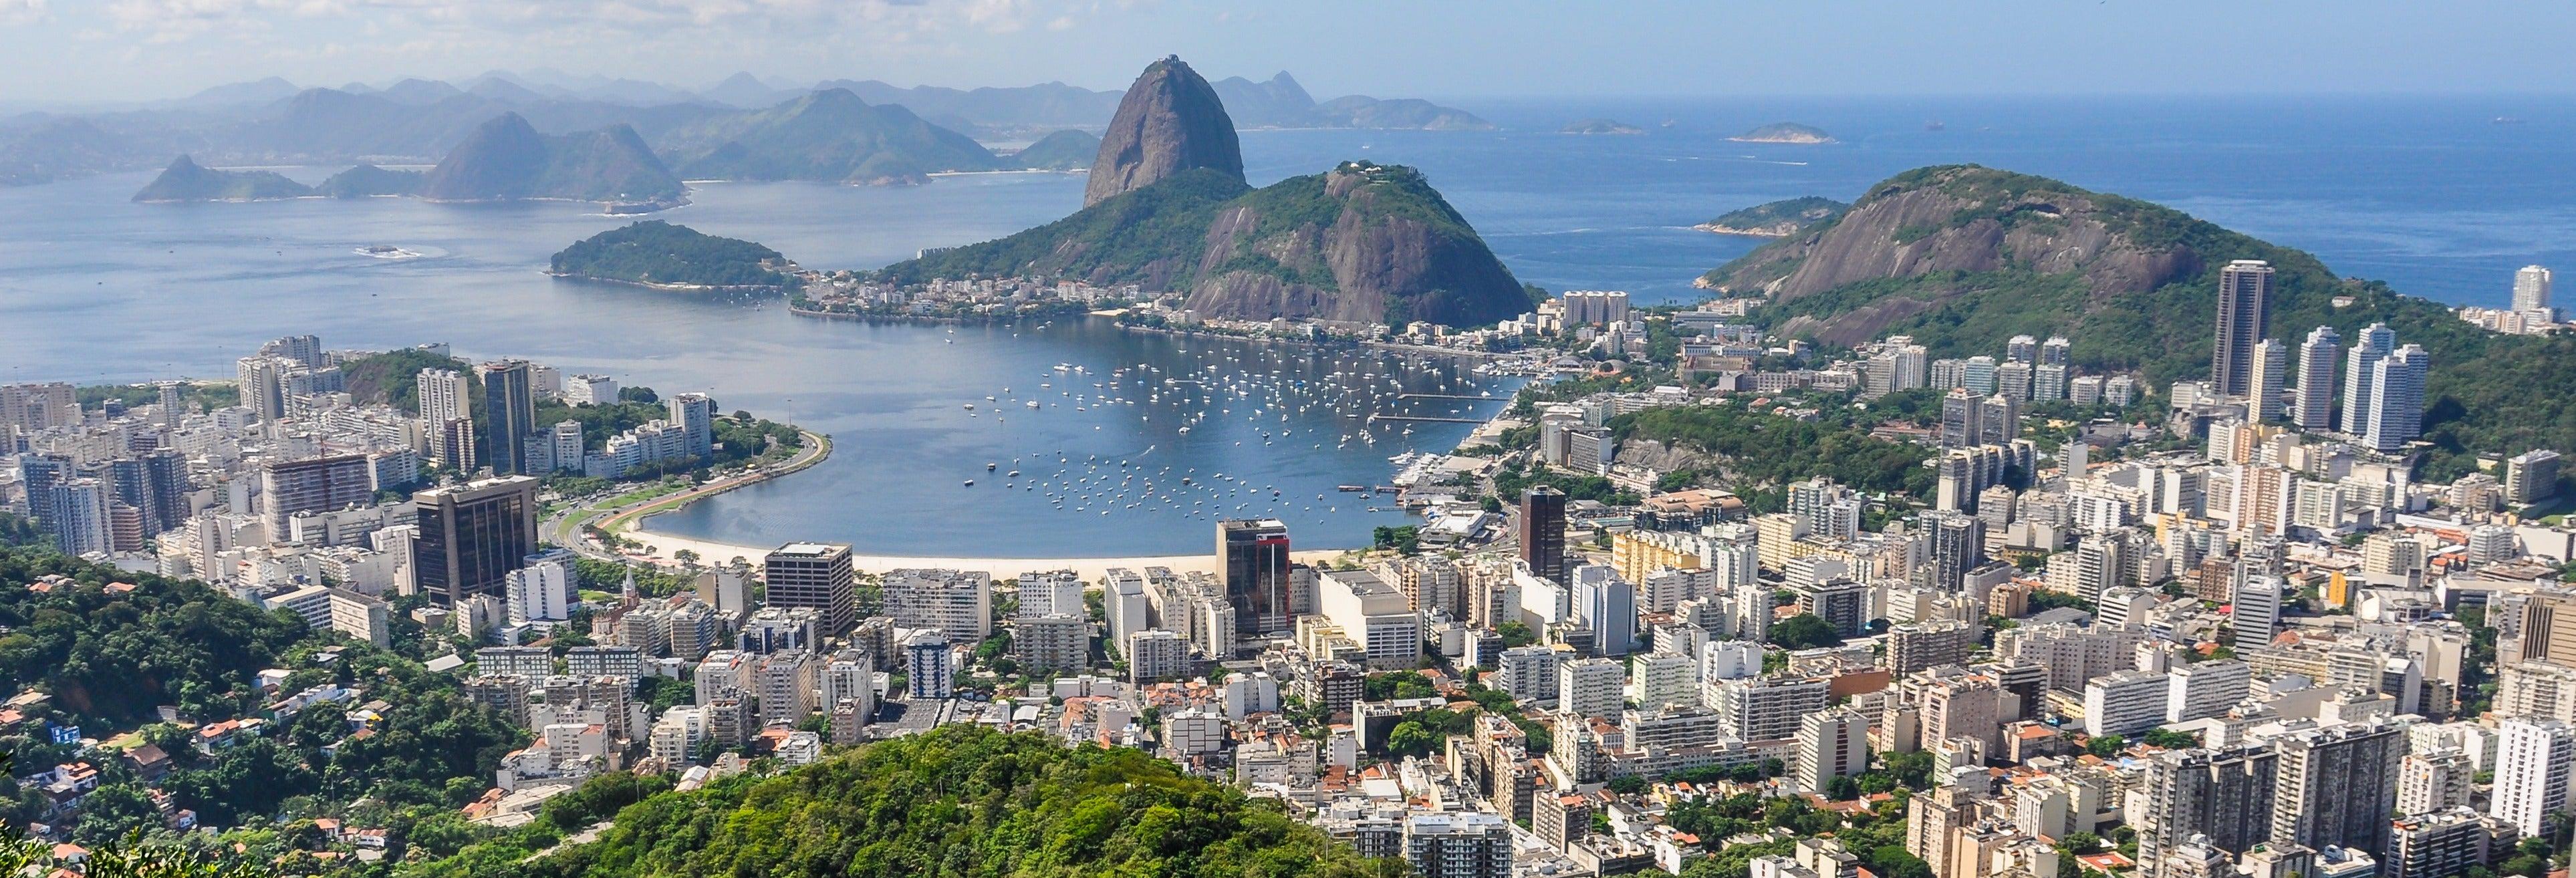 Passeio de helicóptero pelo Rio de Janeiro